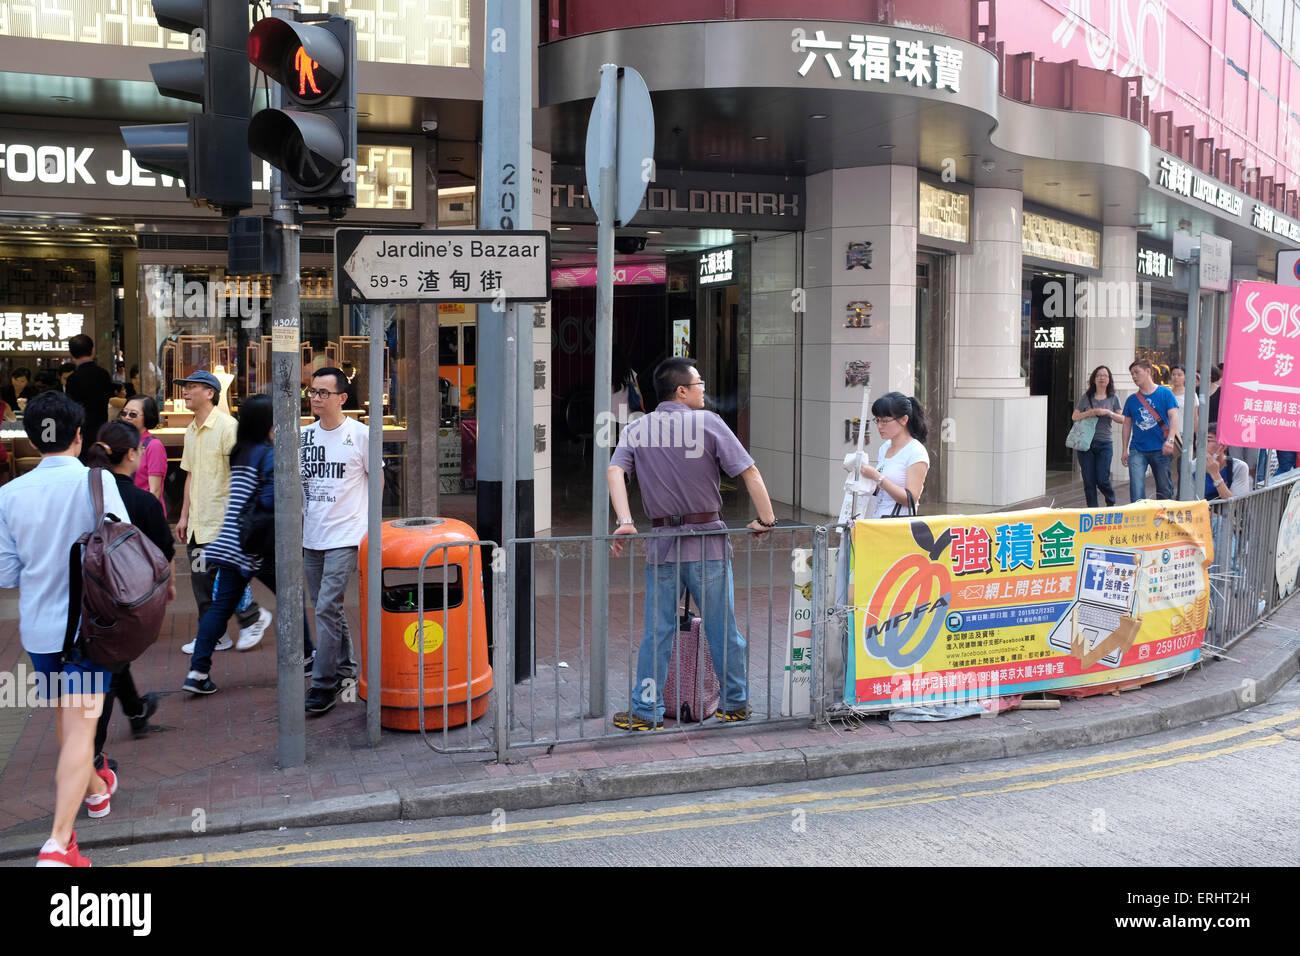 Street scene, Causeway Bay, Hong Kong SAR, China - Stock Image